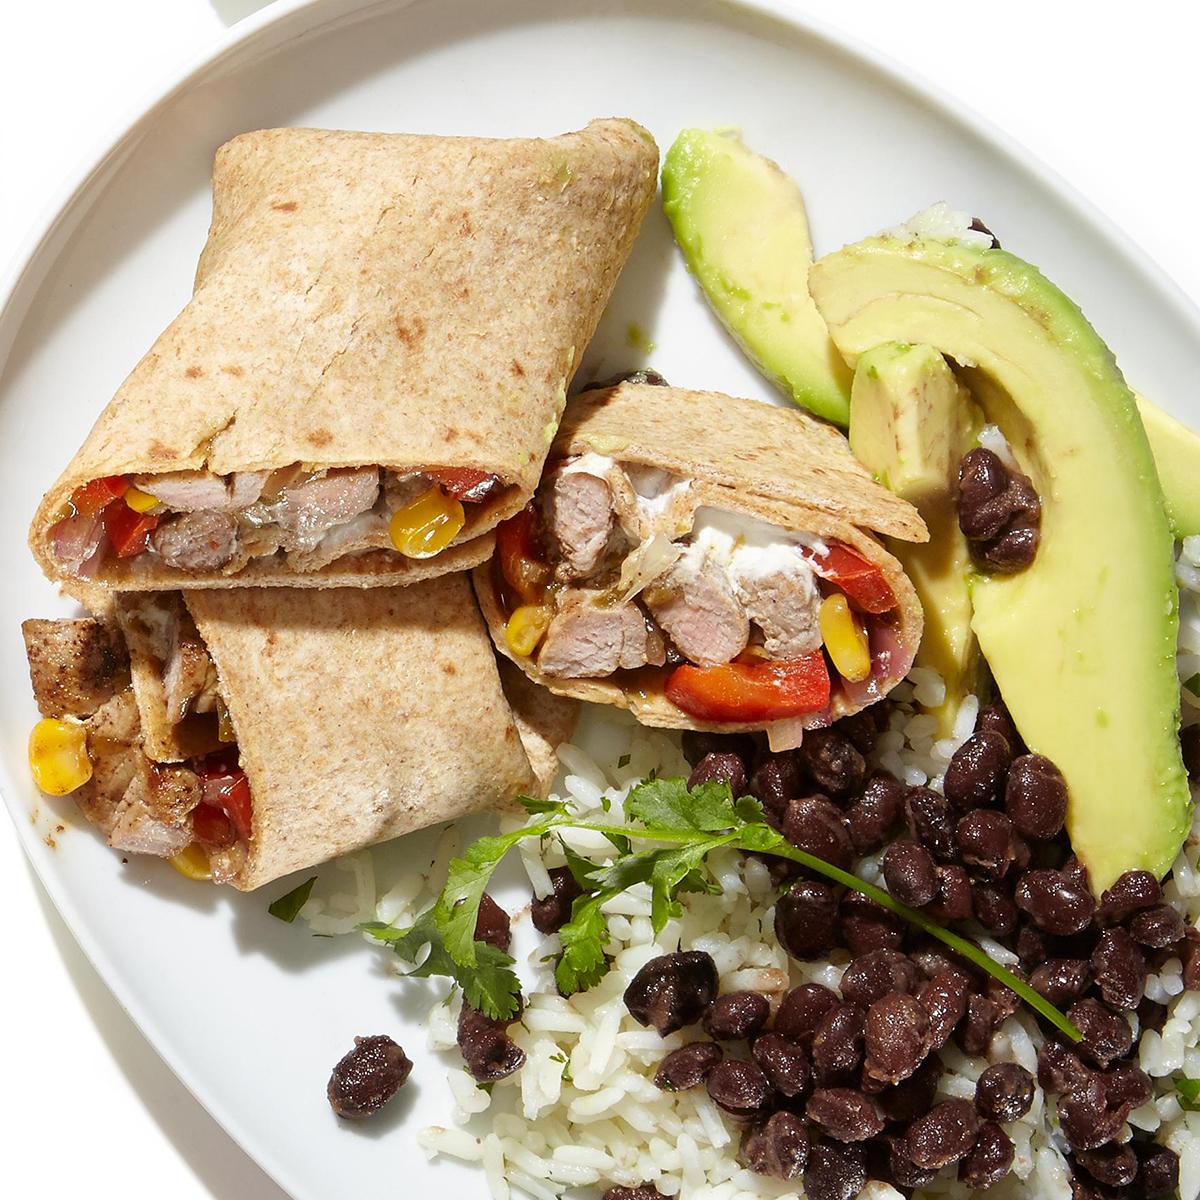 Zesty Pork Burrito